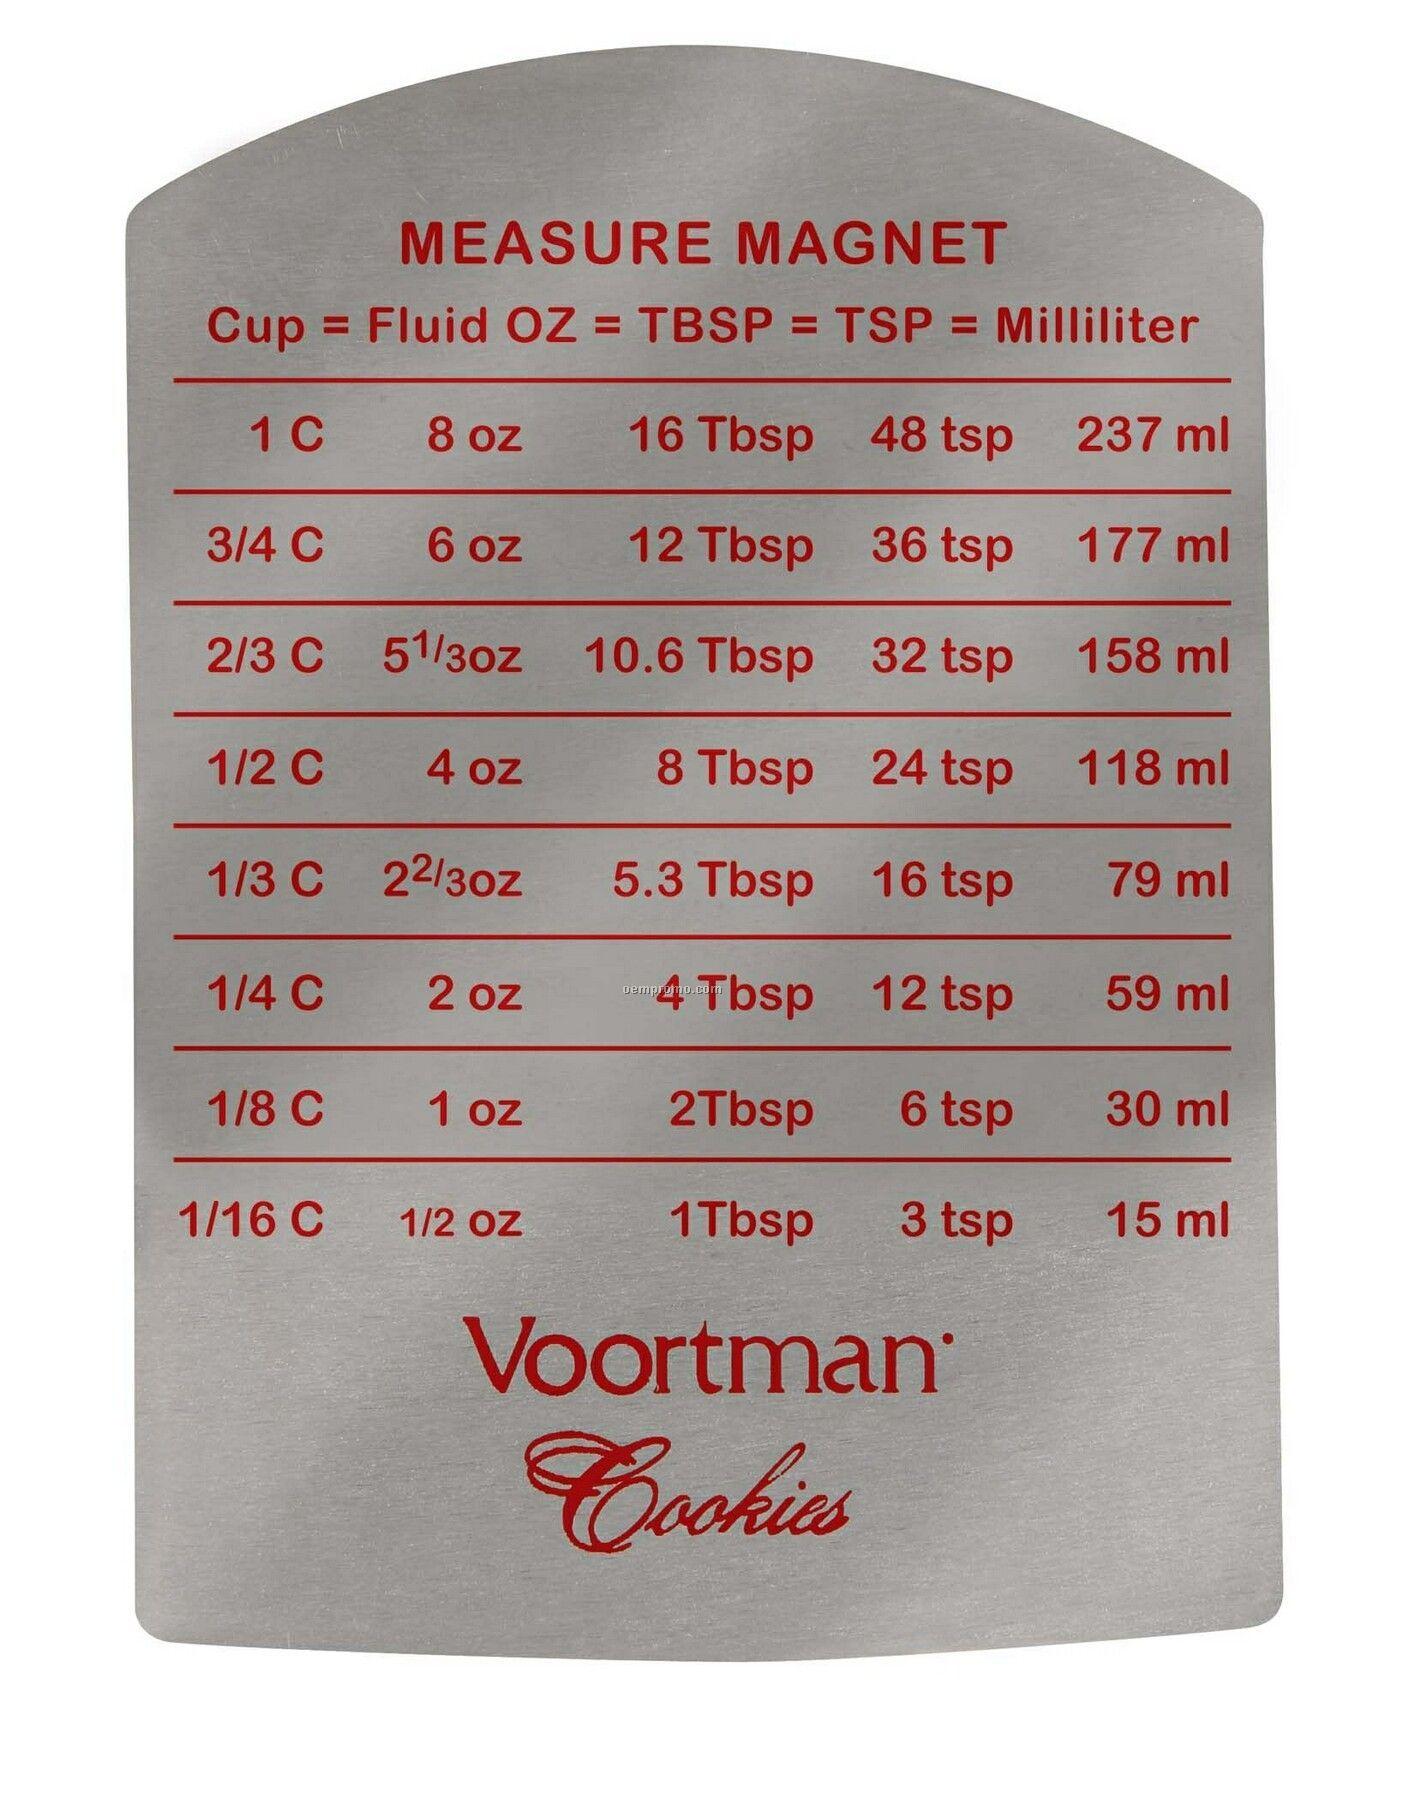 Rcc koozie magnetic measurement conversion chartchina wholesale rcc koozie magnetic measurement conversion chart nvjuhfo Image collections